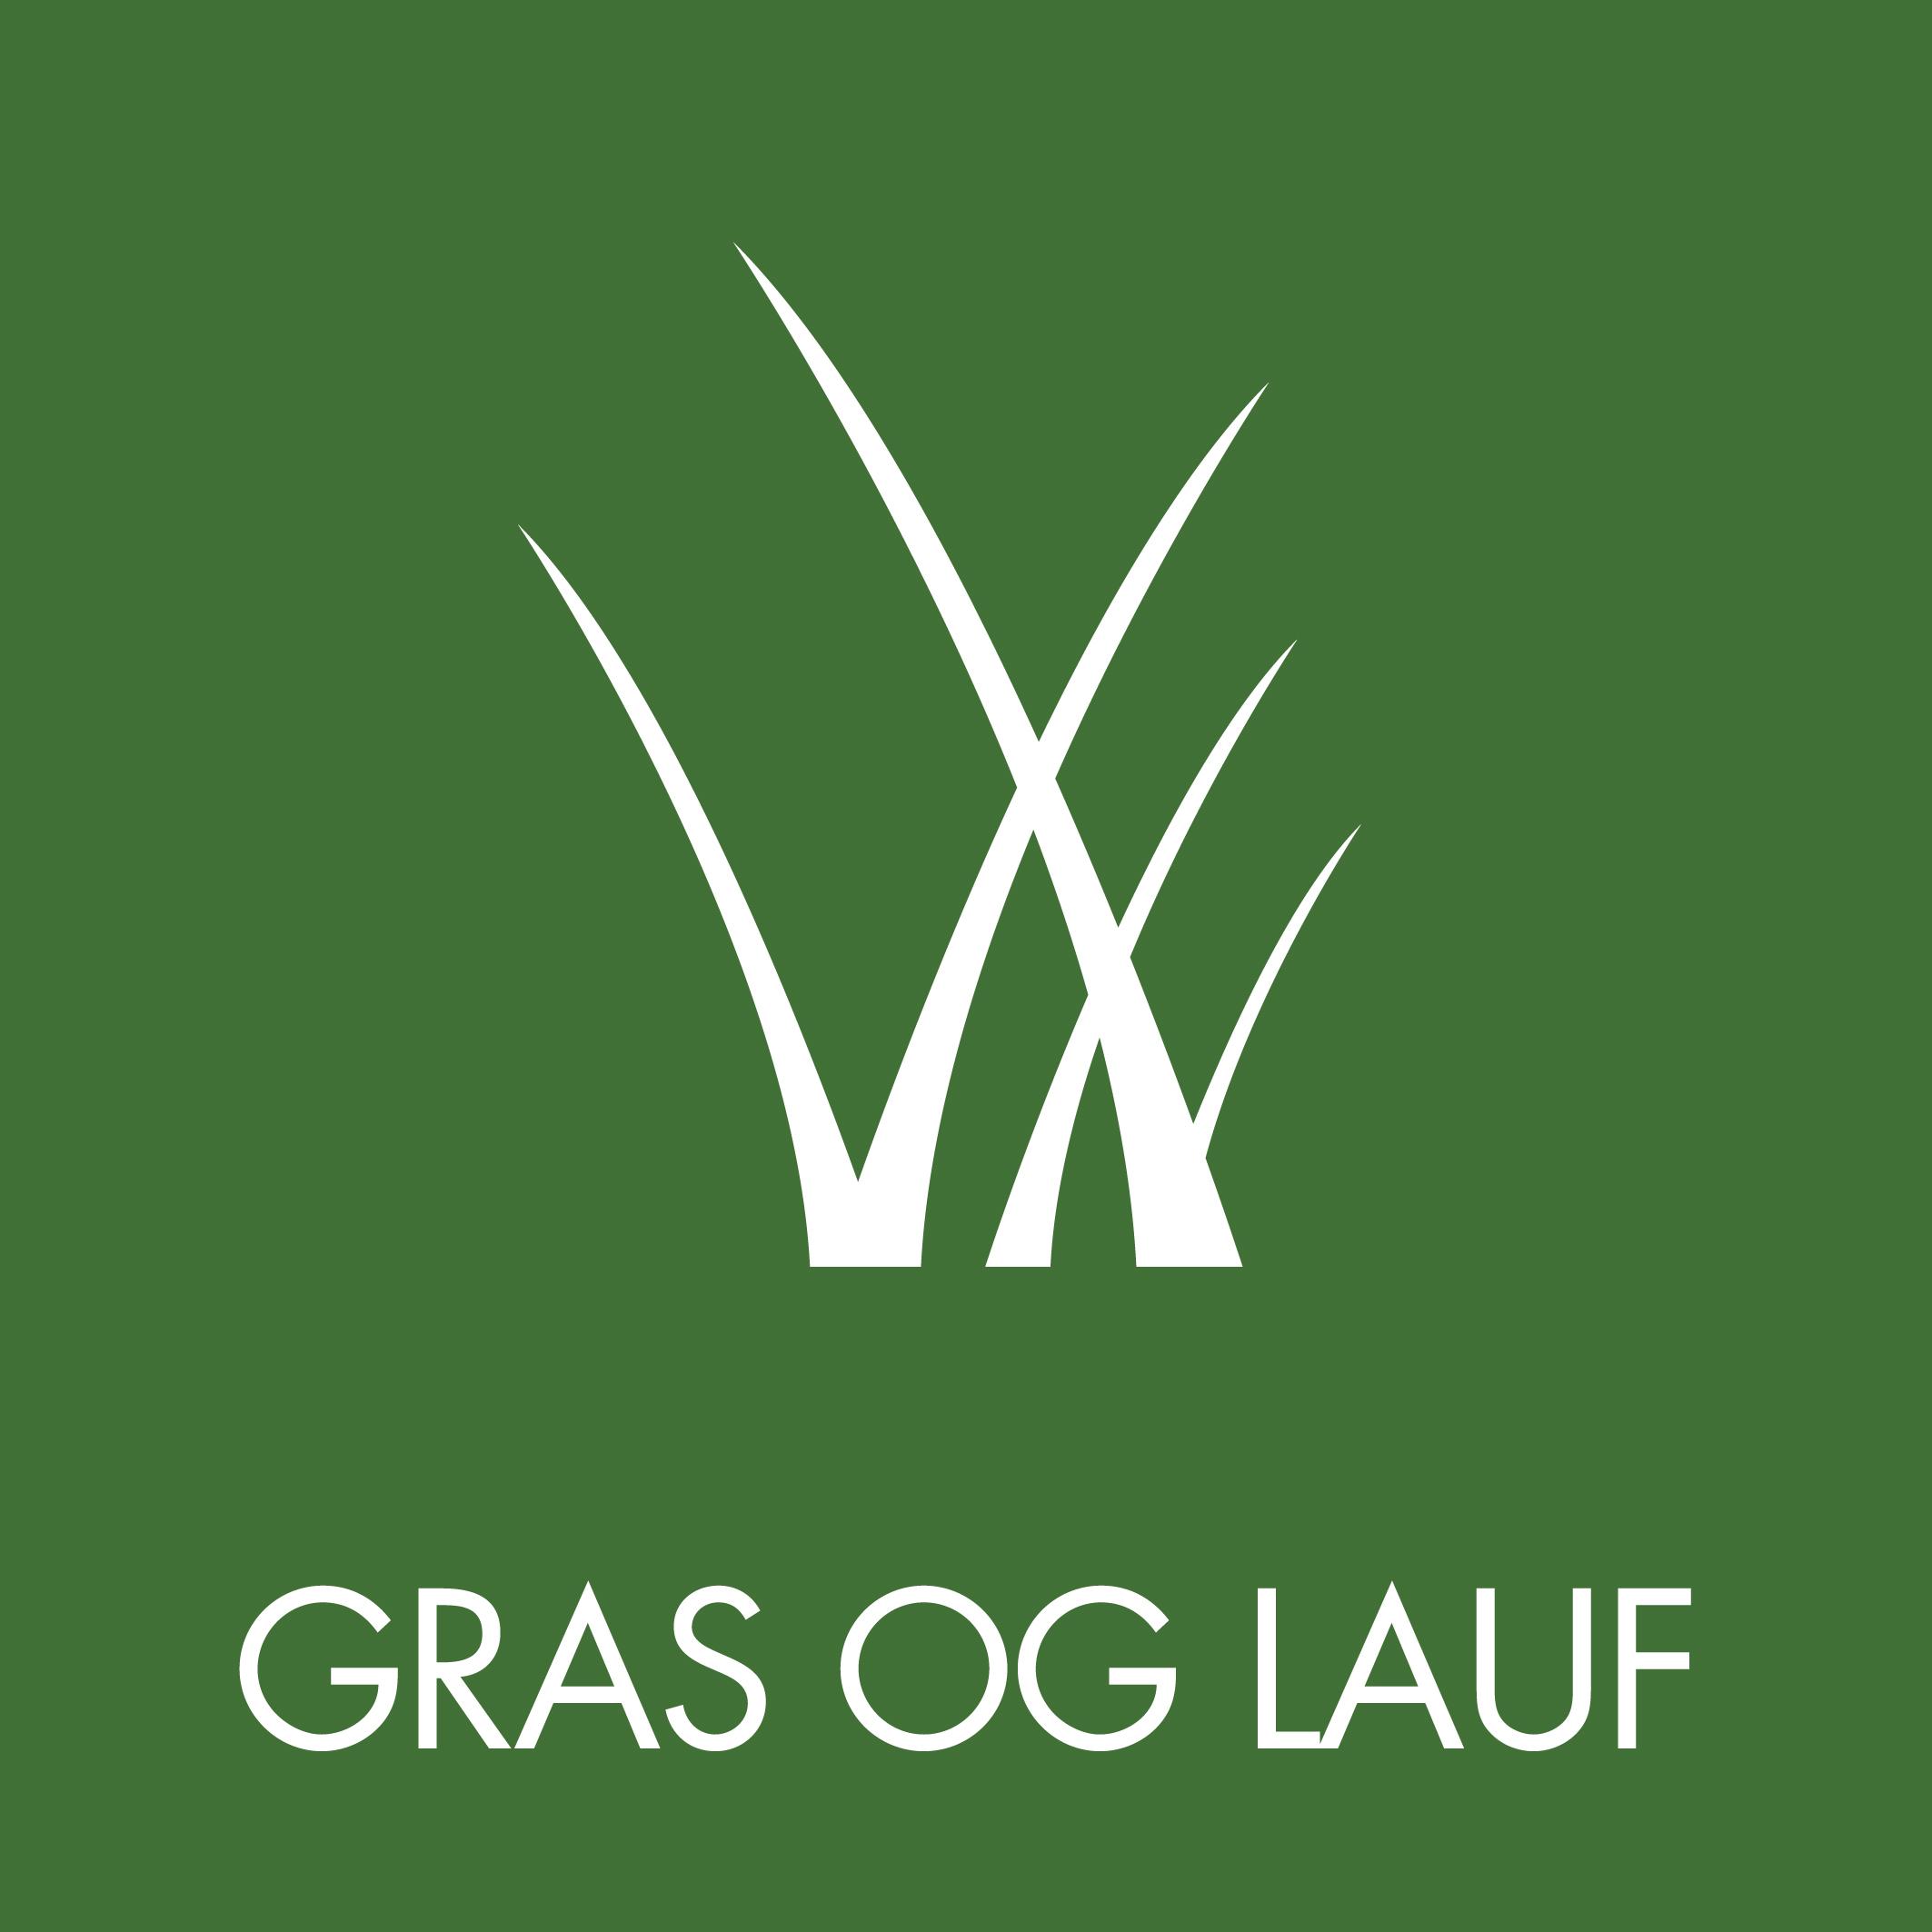 Gras og lauf